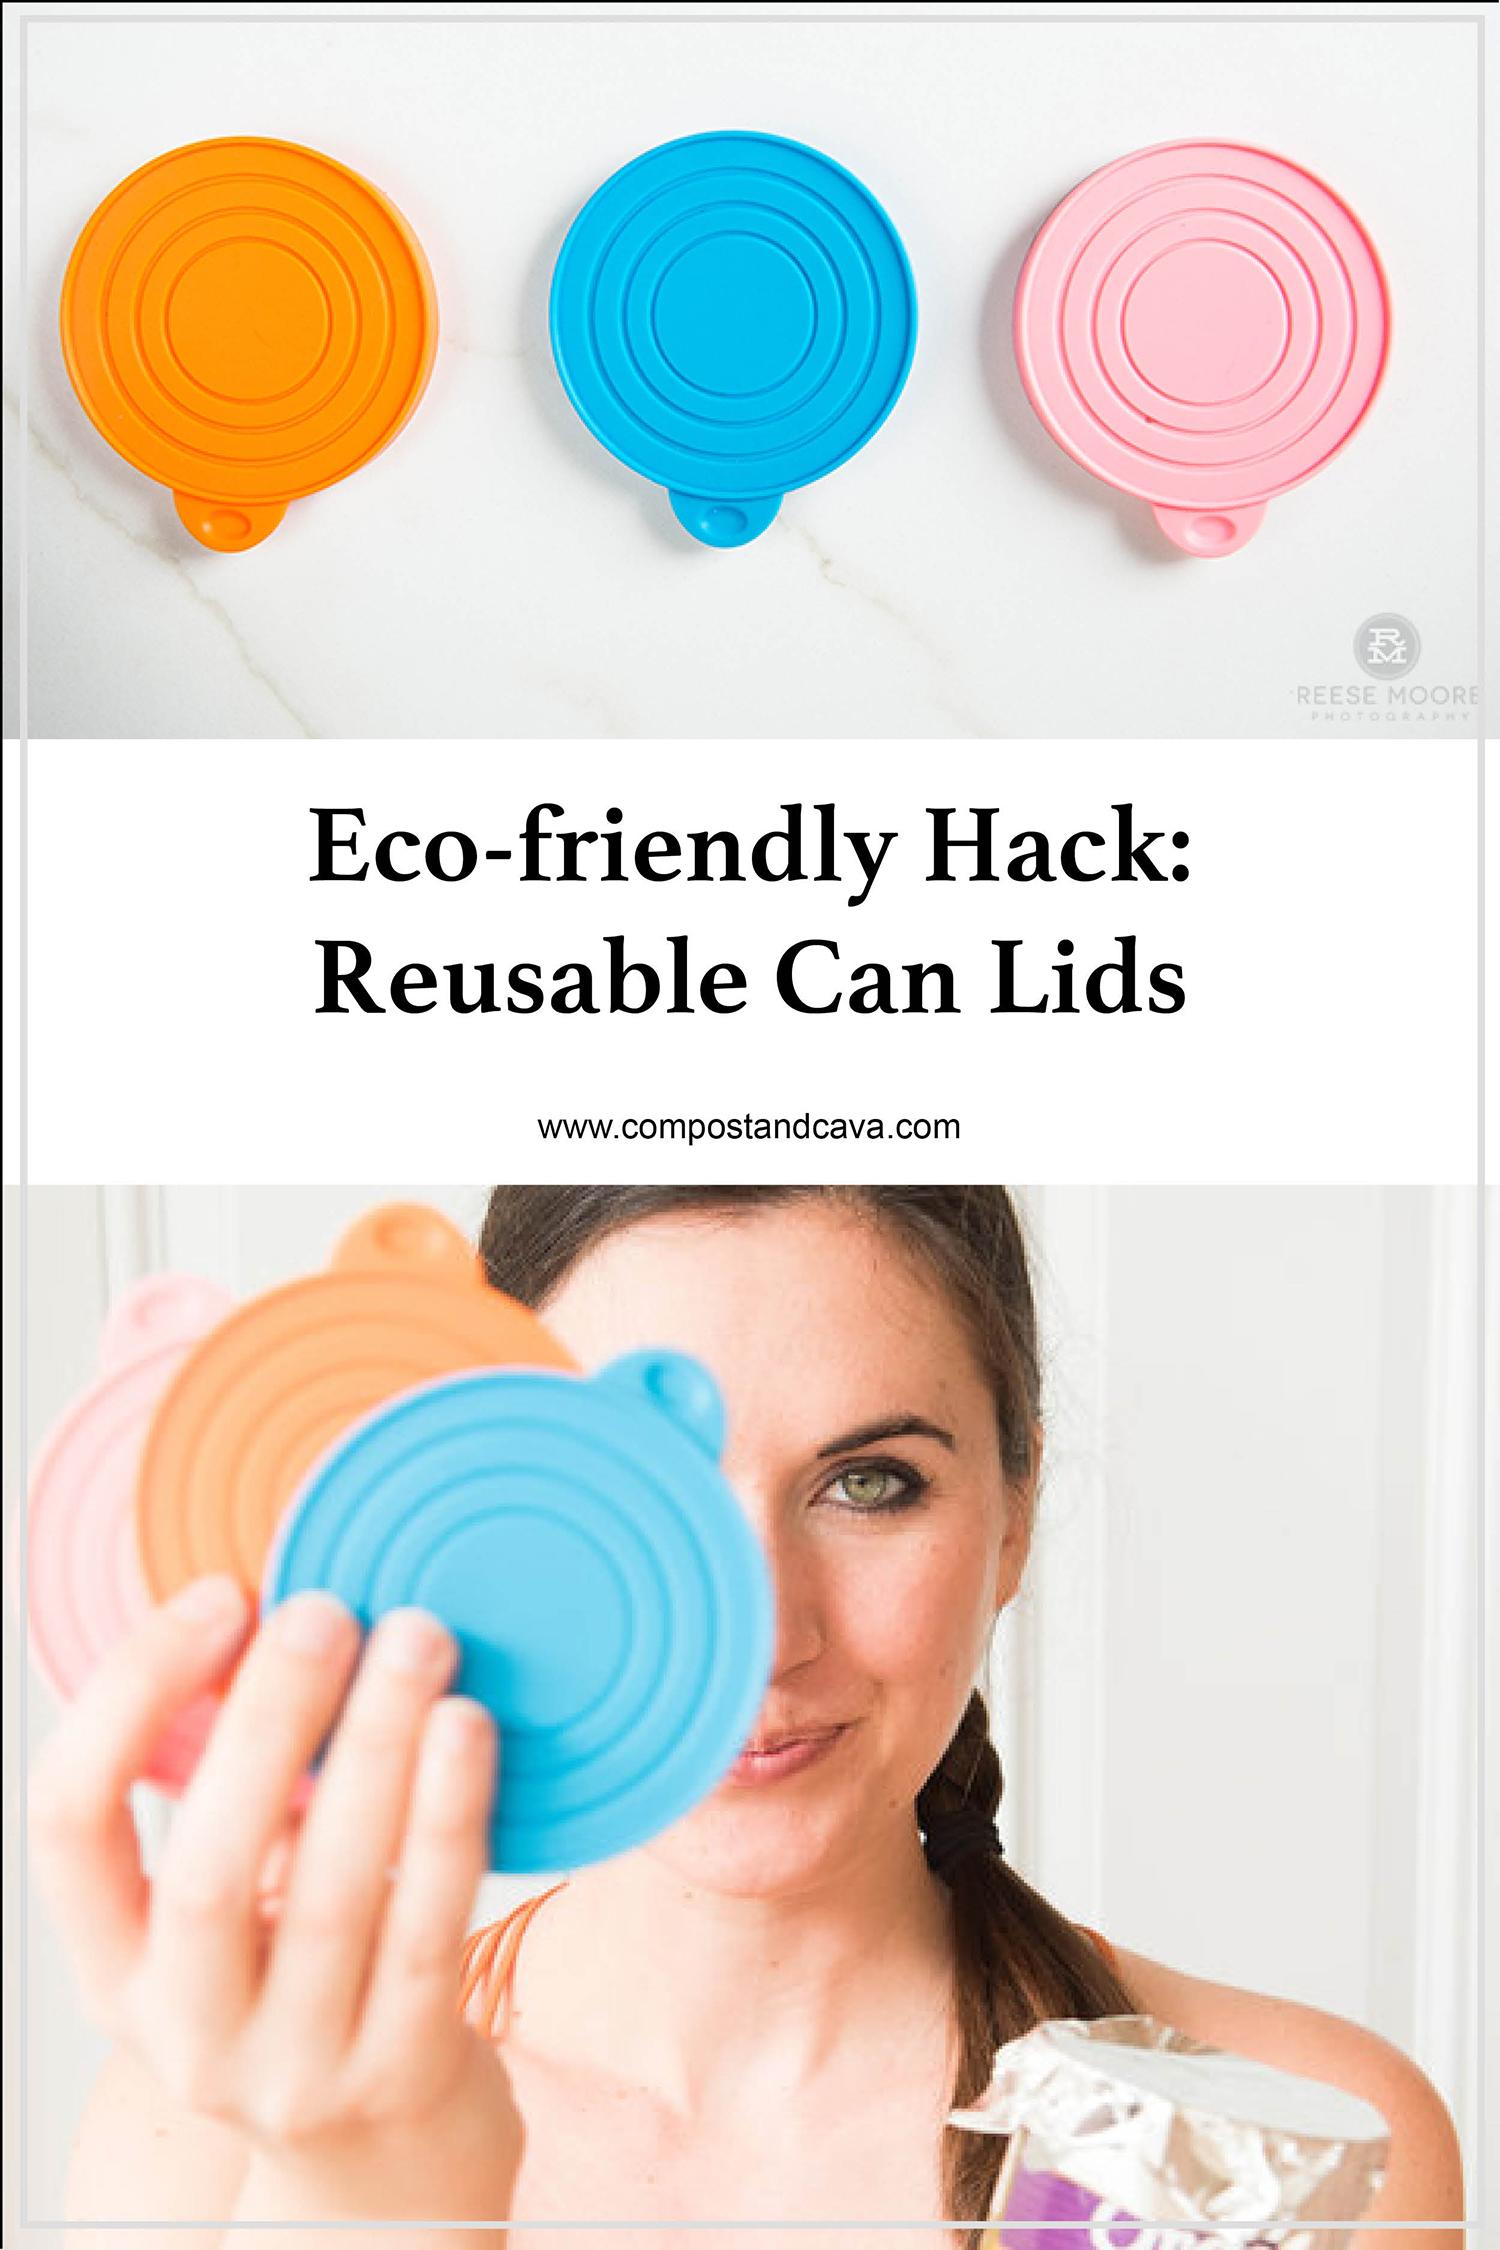 Eco-friendly Kitchen Hack- Reusable Can Lids